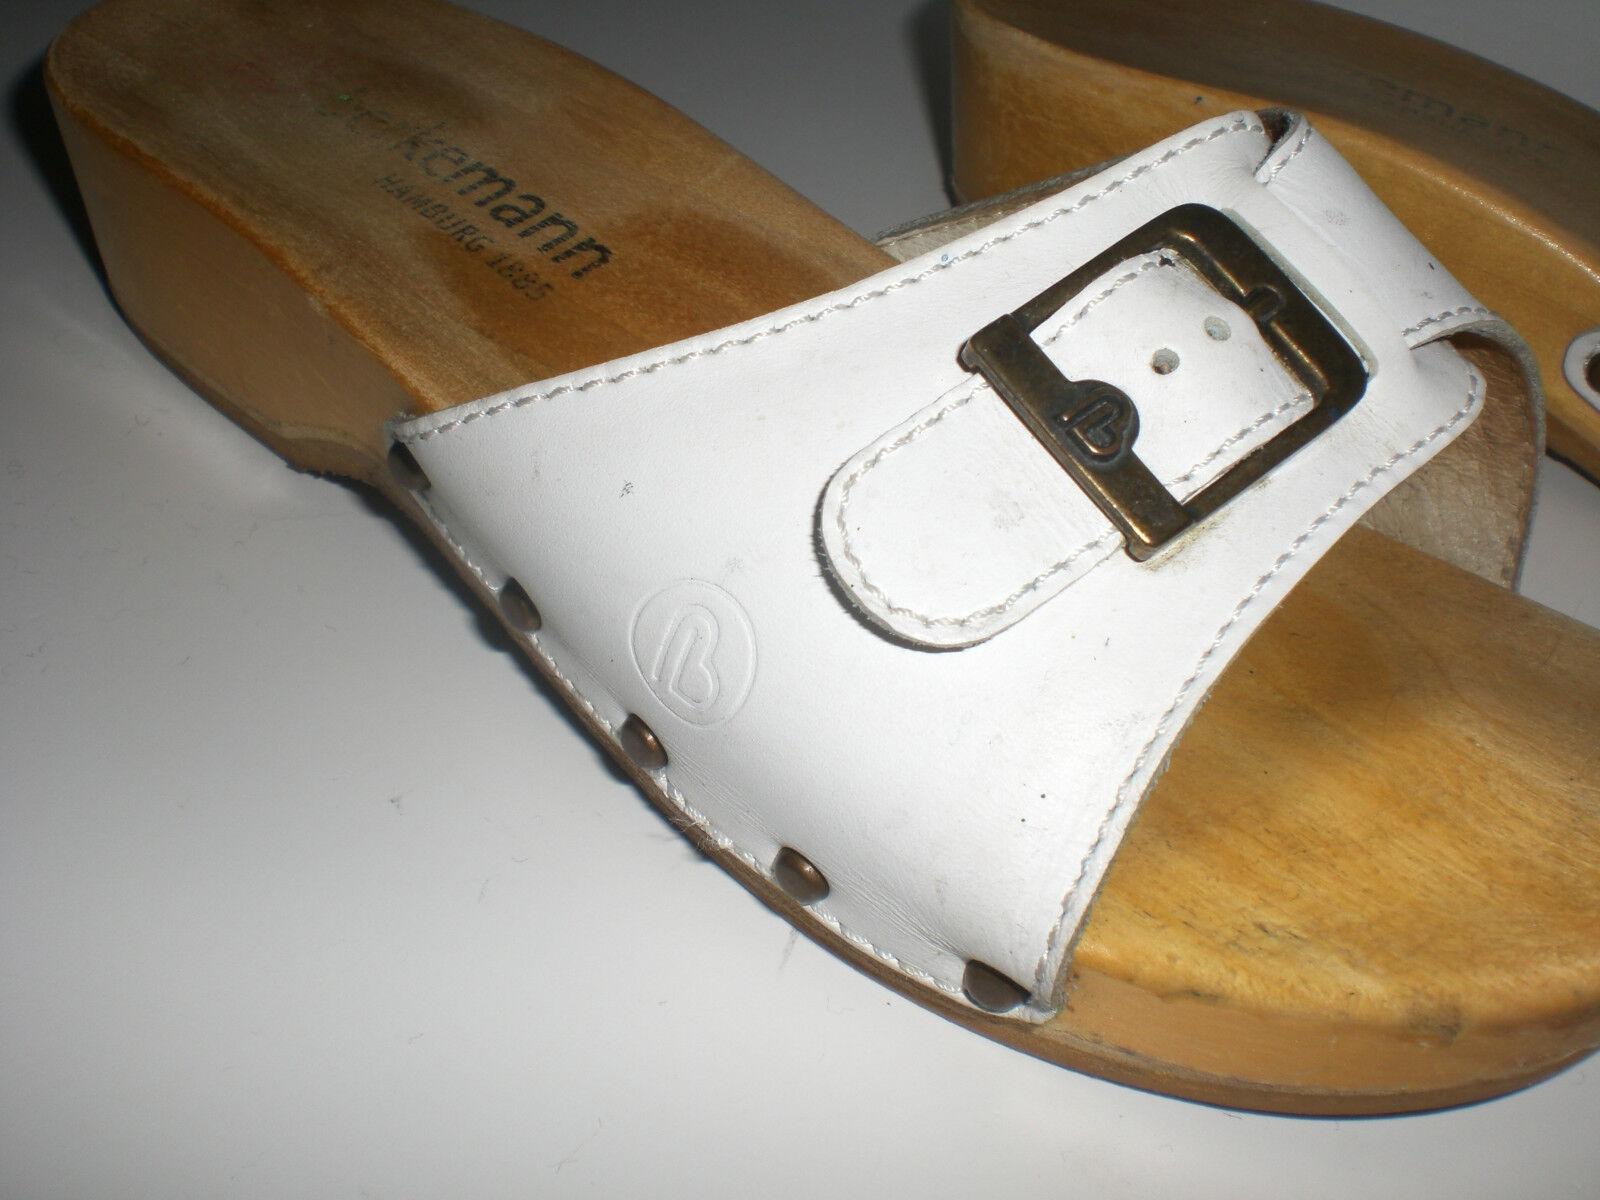 Berkemann Vintage HolzSandalen,Holzclogs Holzklepper Klapperlatscen Gr.6 Gr.6 Klapperlatscen 4f11ce